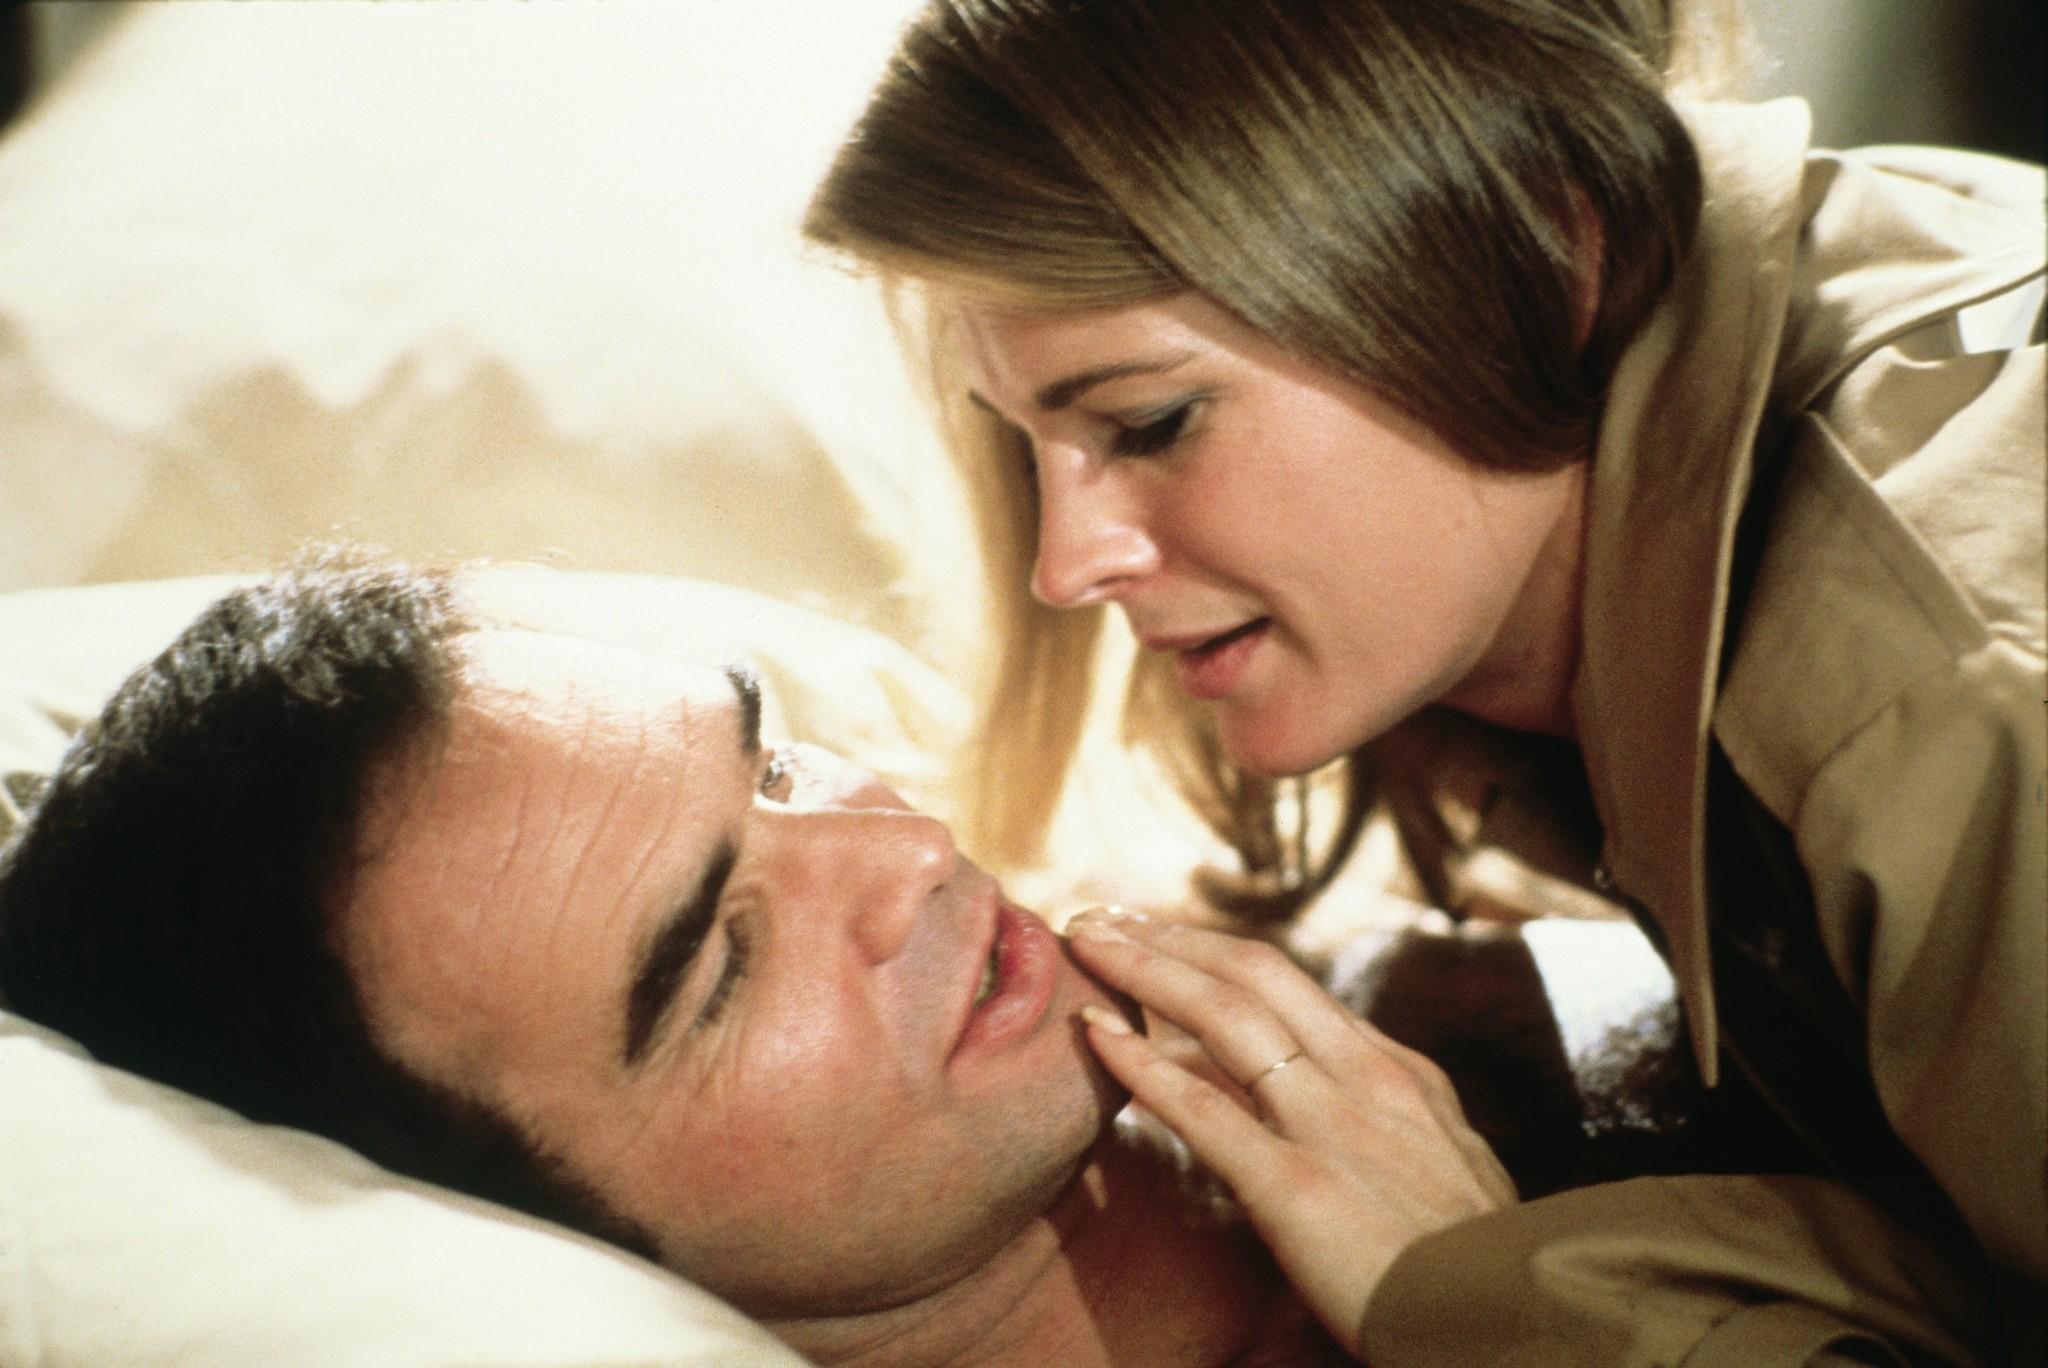 Still of Candice Bergen and Burt Reynolds in Starting Over (1979)